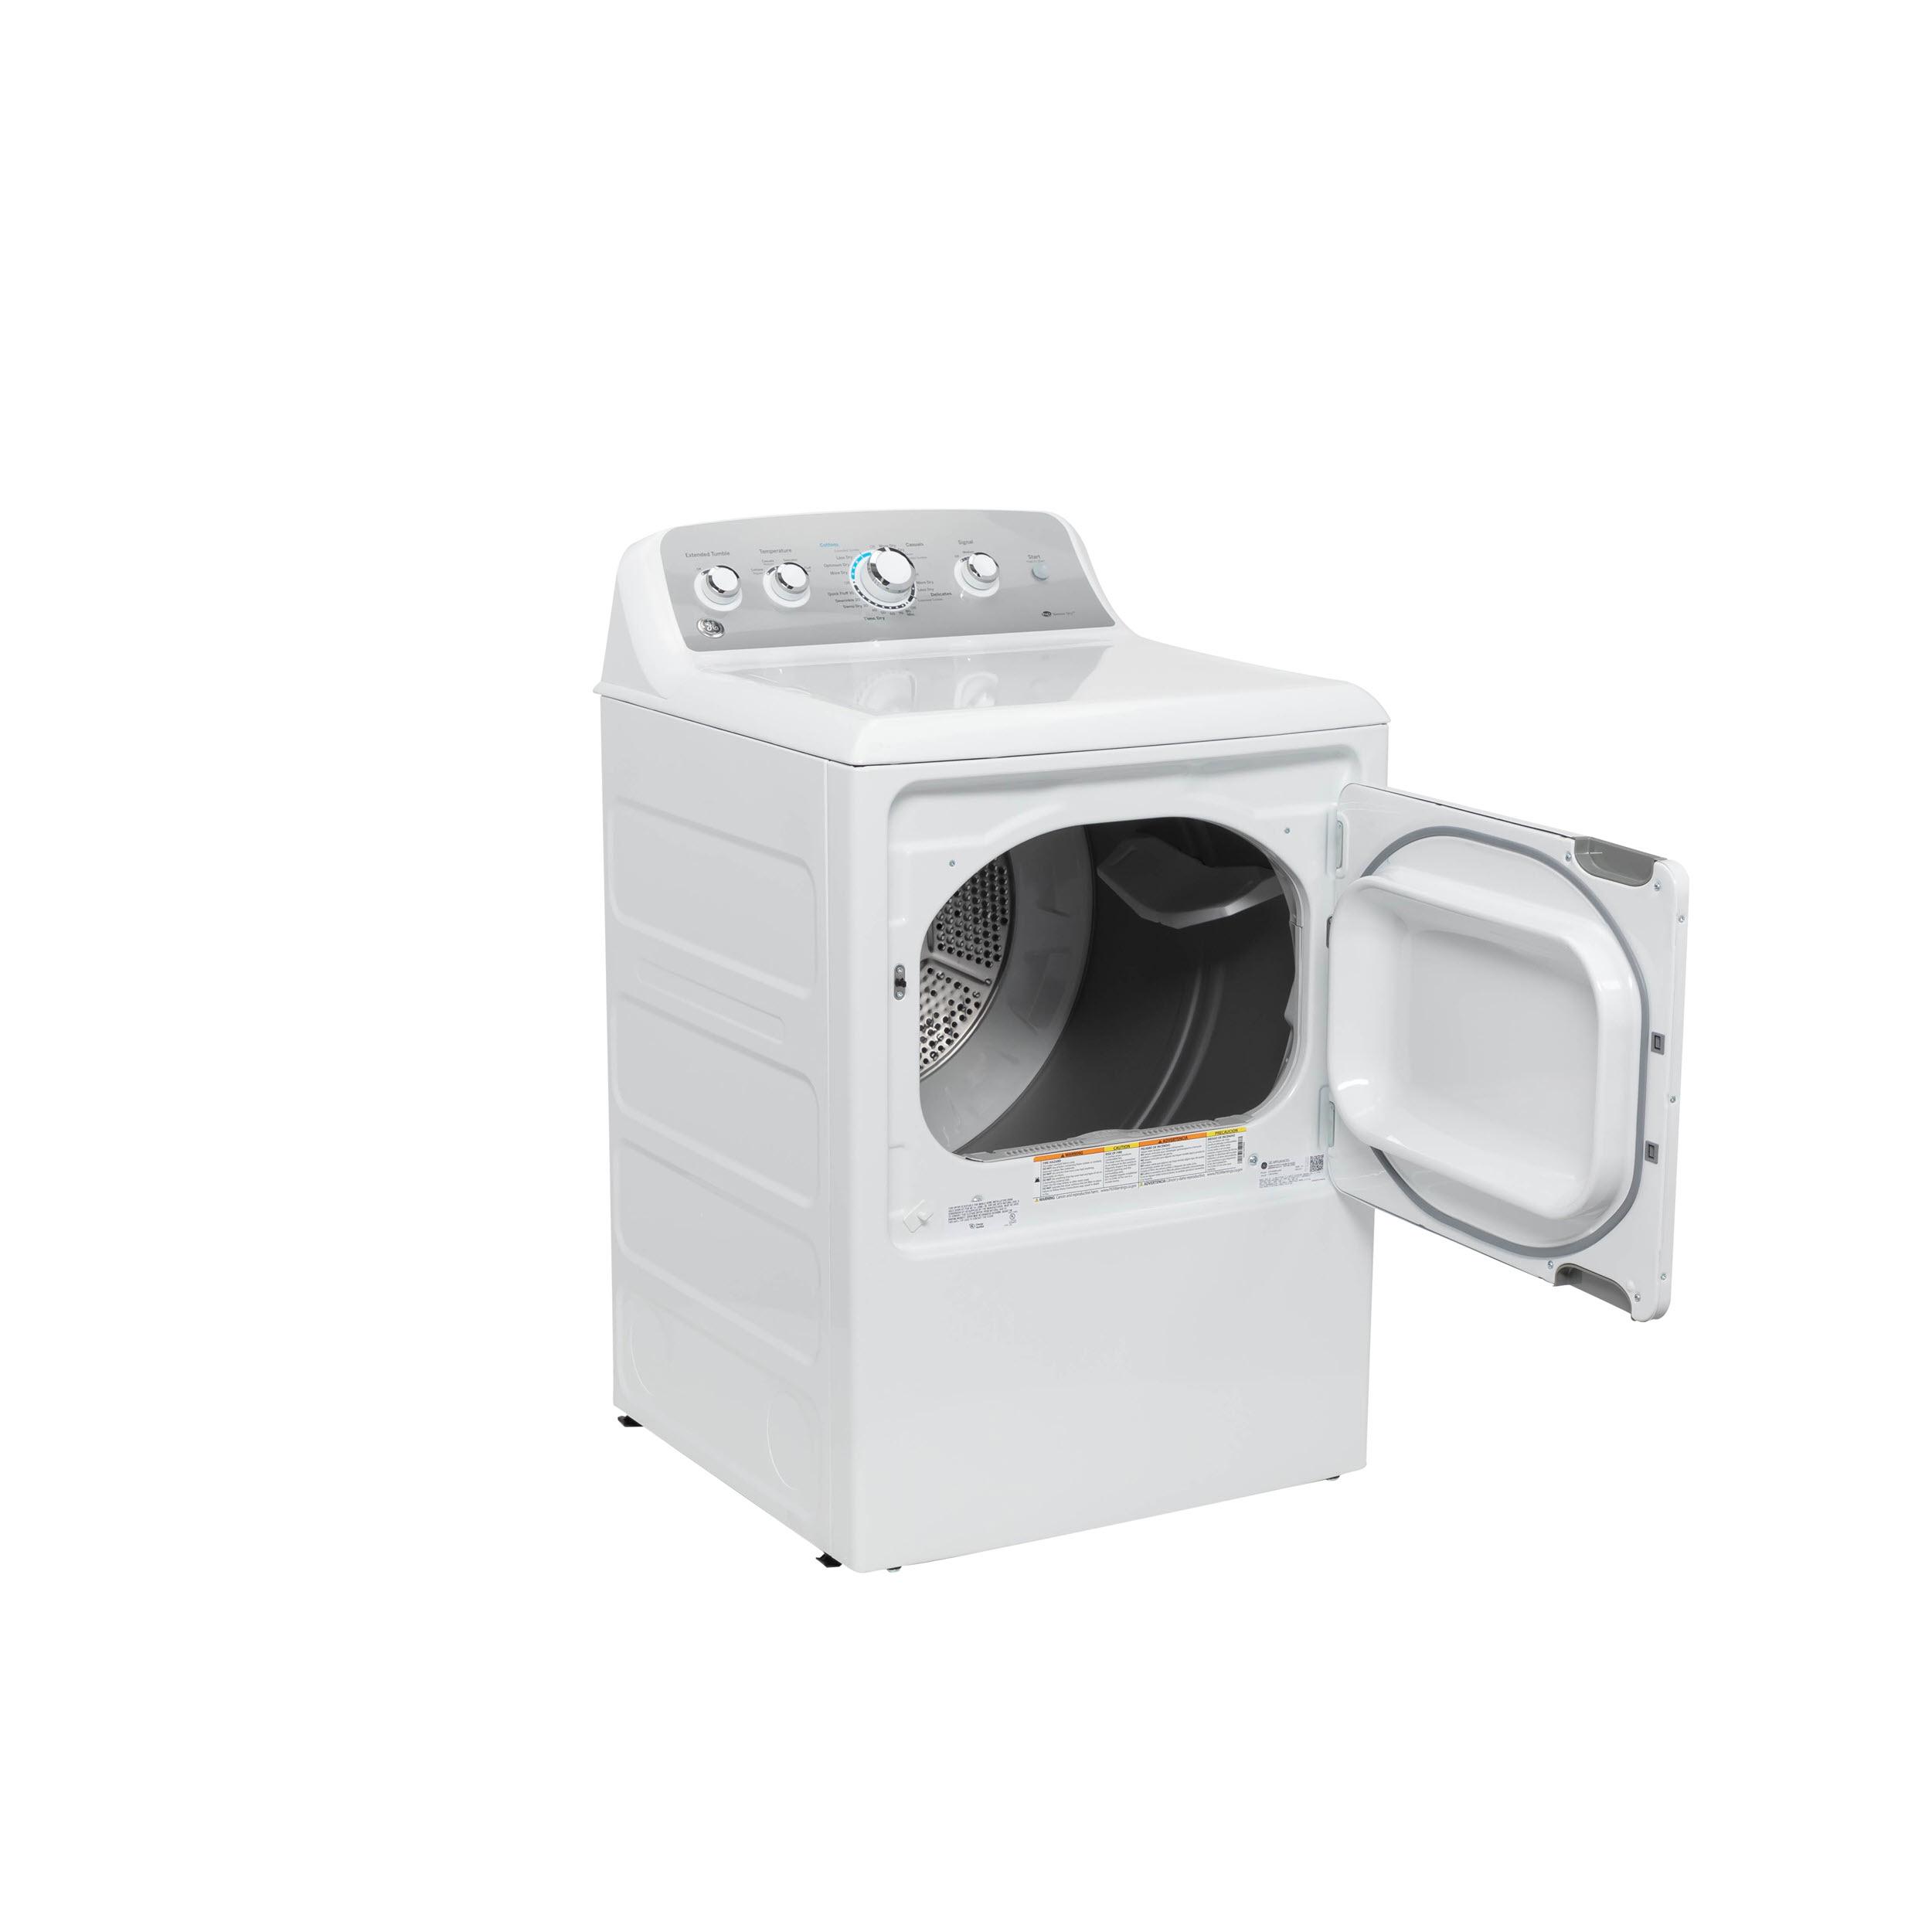 Model: GTD45GASJWS | GE GE® 7.2 cu. ft. Capacity aluminized alloy drum Gas Dryer with Sensor Dry